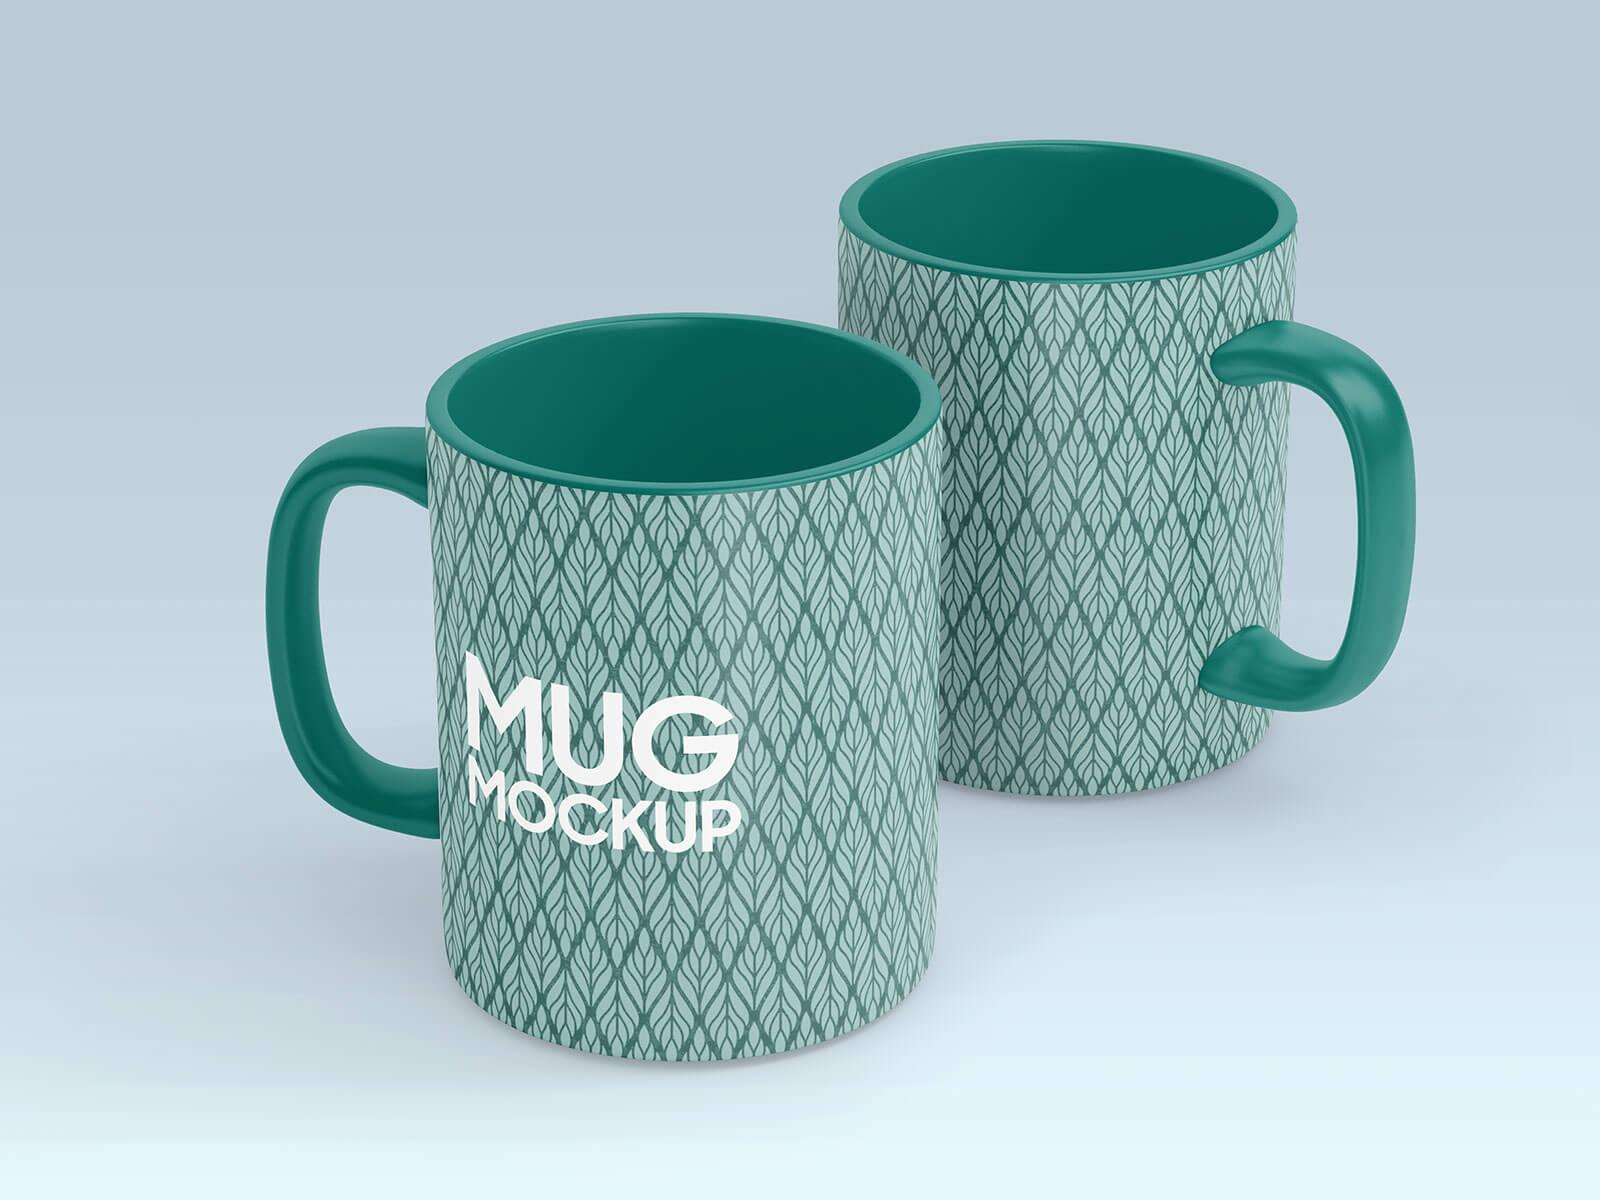 Free High Quality Mug Mockup PSD (2)